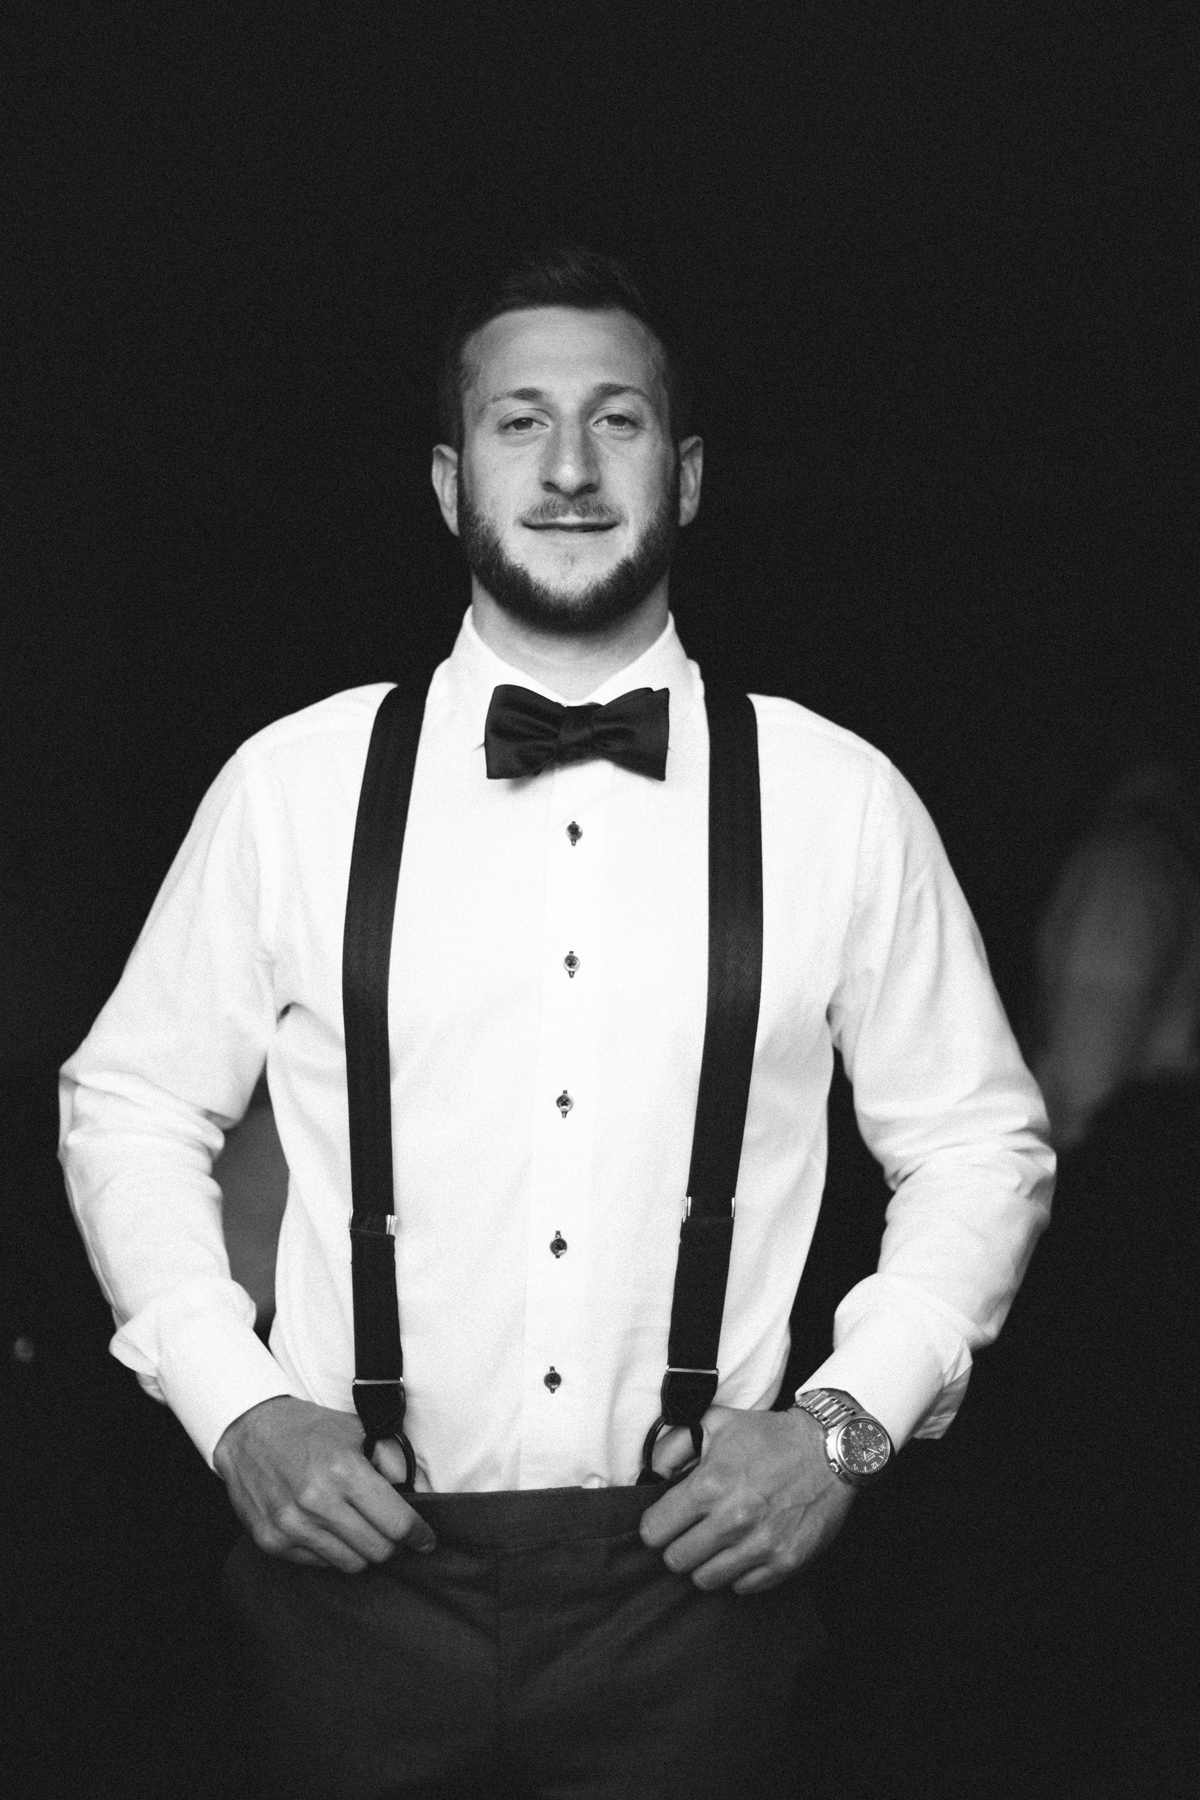 043-beaver-creek--groom--decor--bow-tie--wedding-photography--black-and-white.jpg